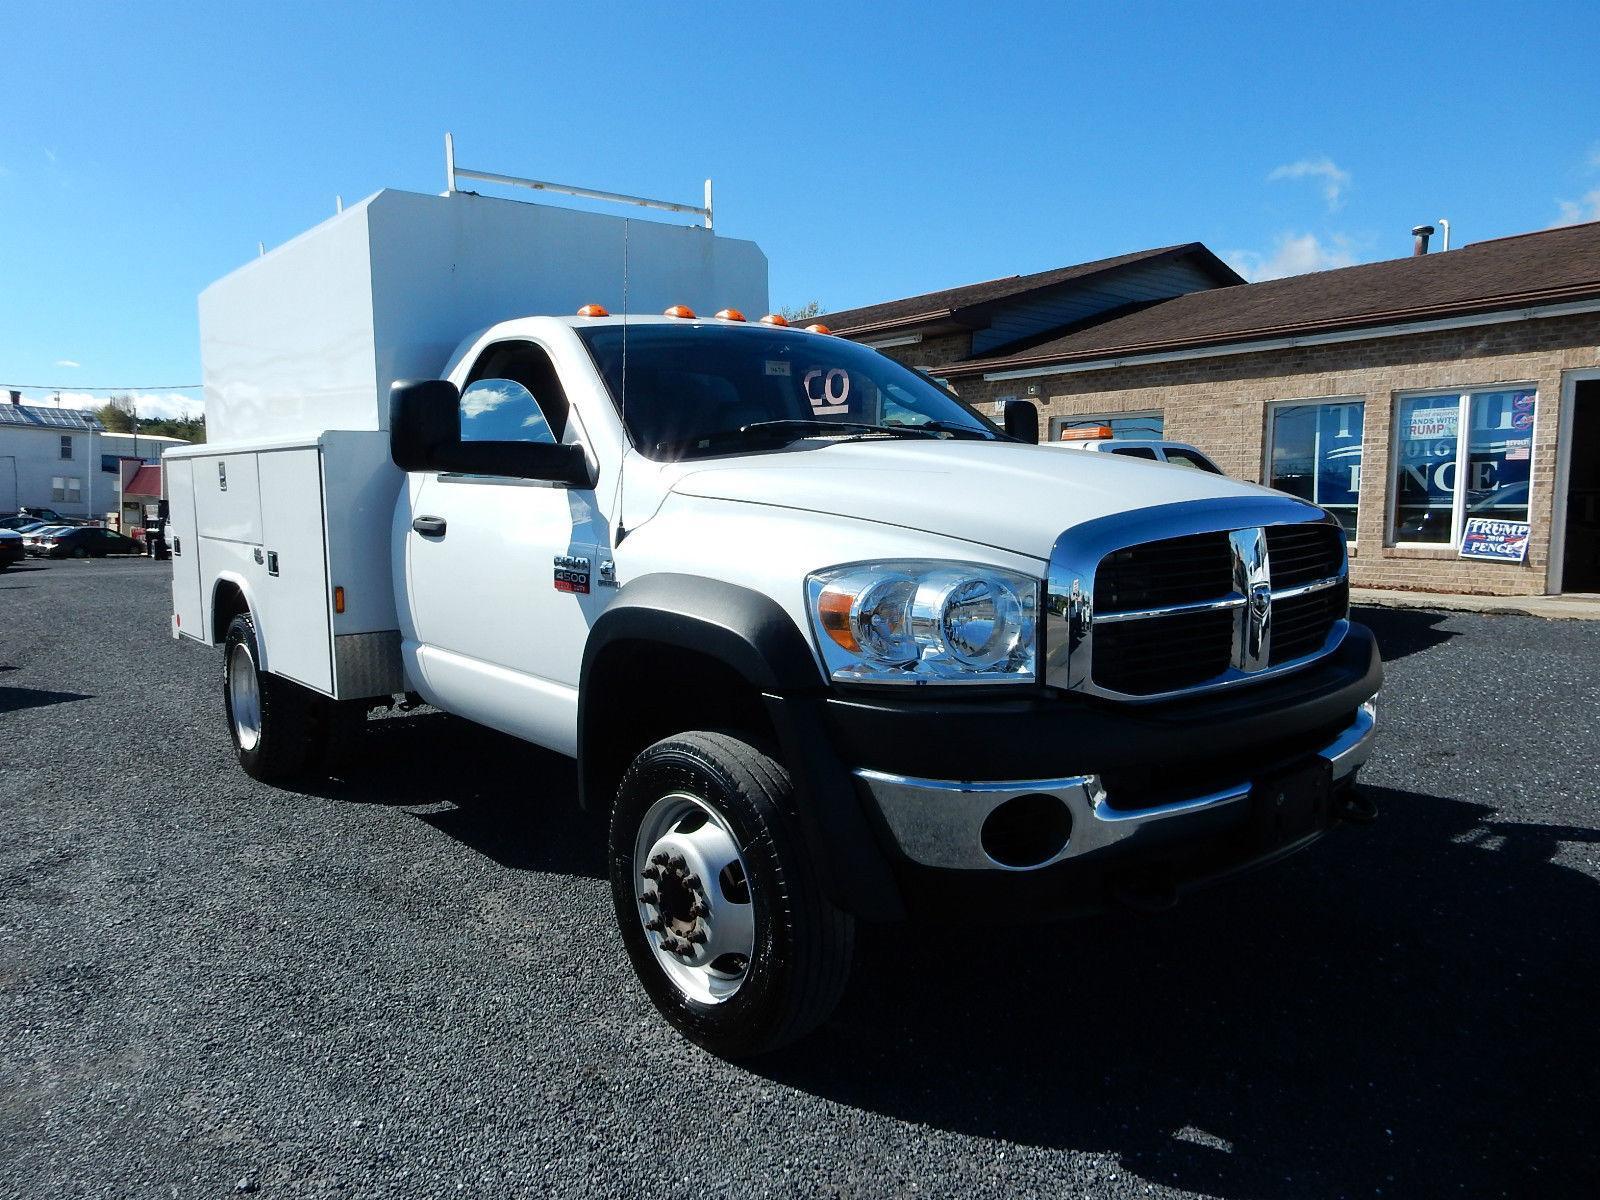 Craigslist Albany New York Cars And Trucks